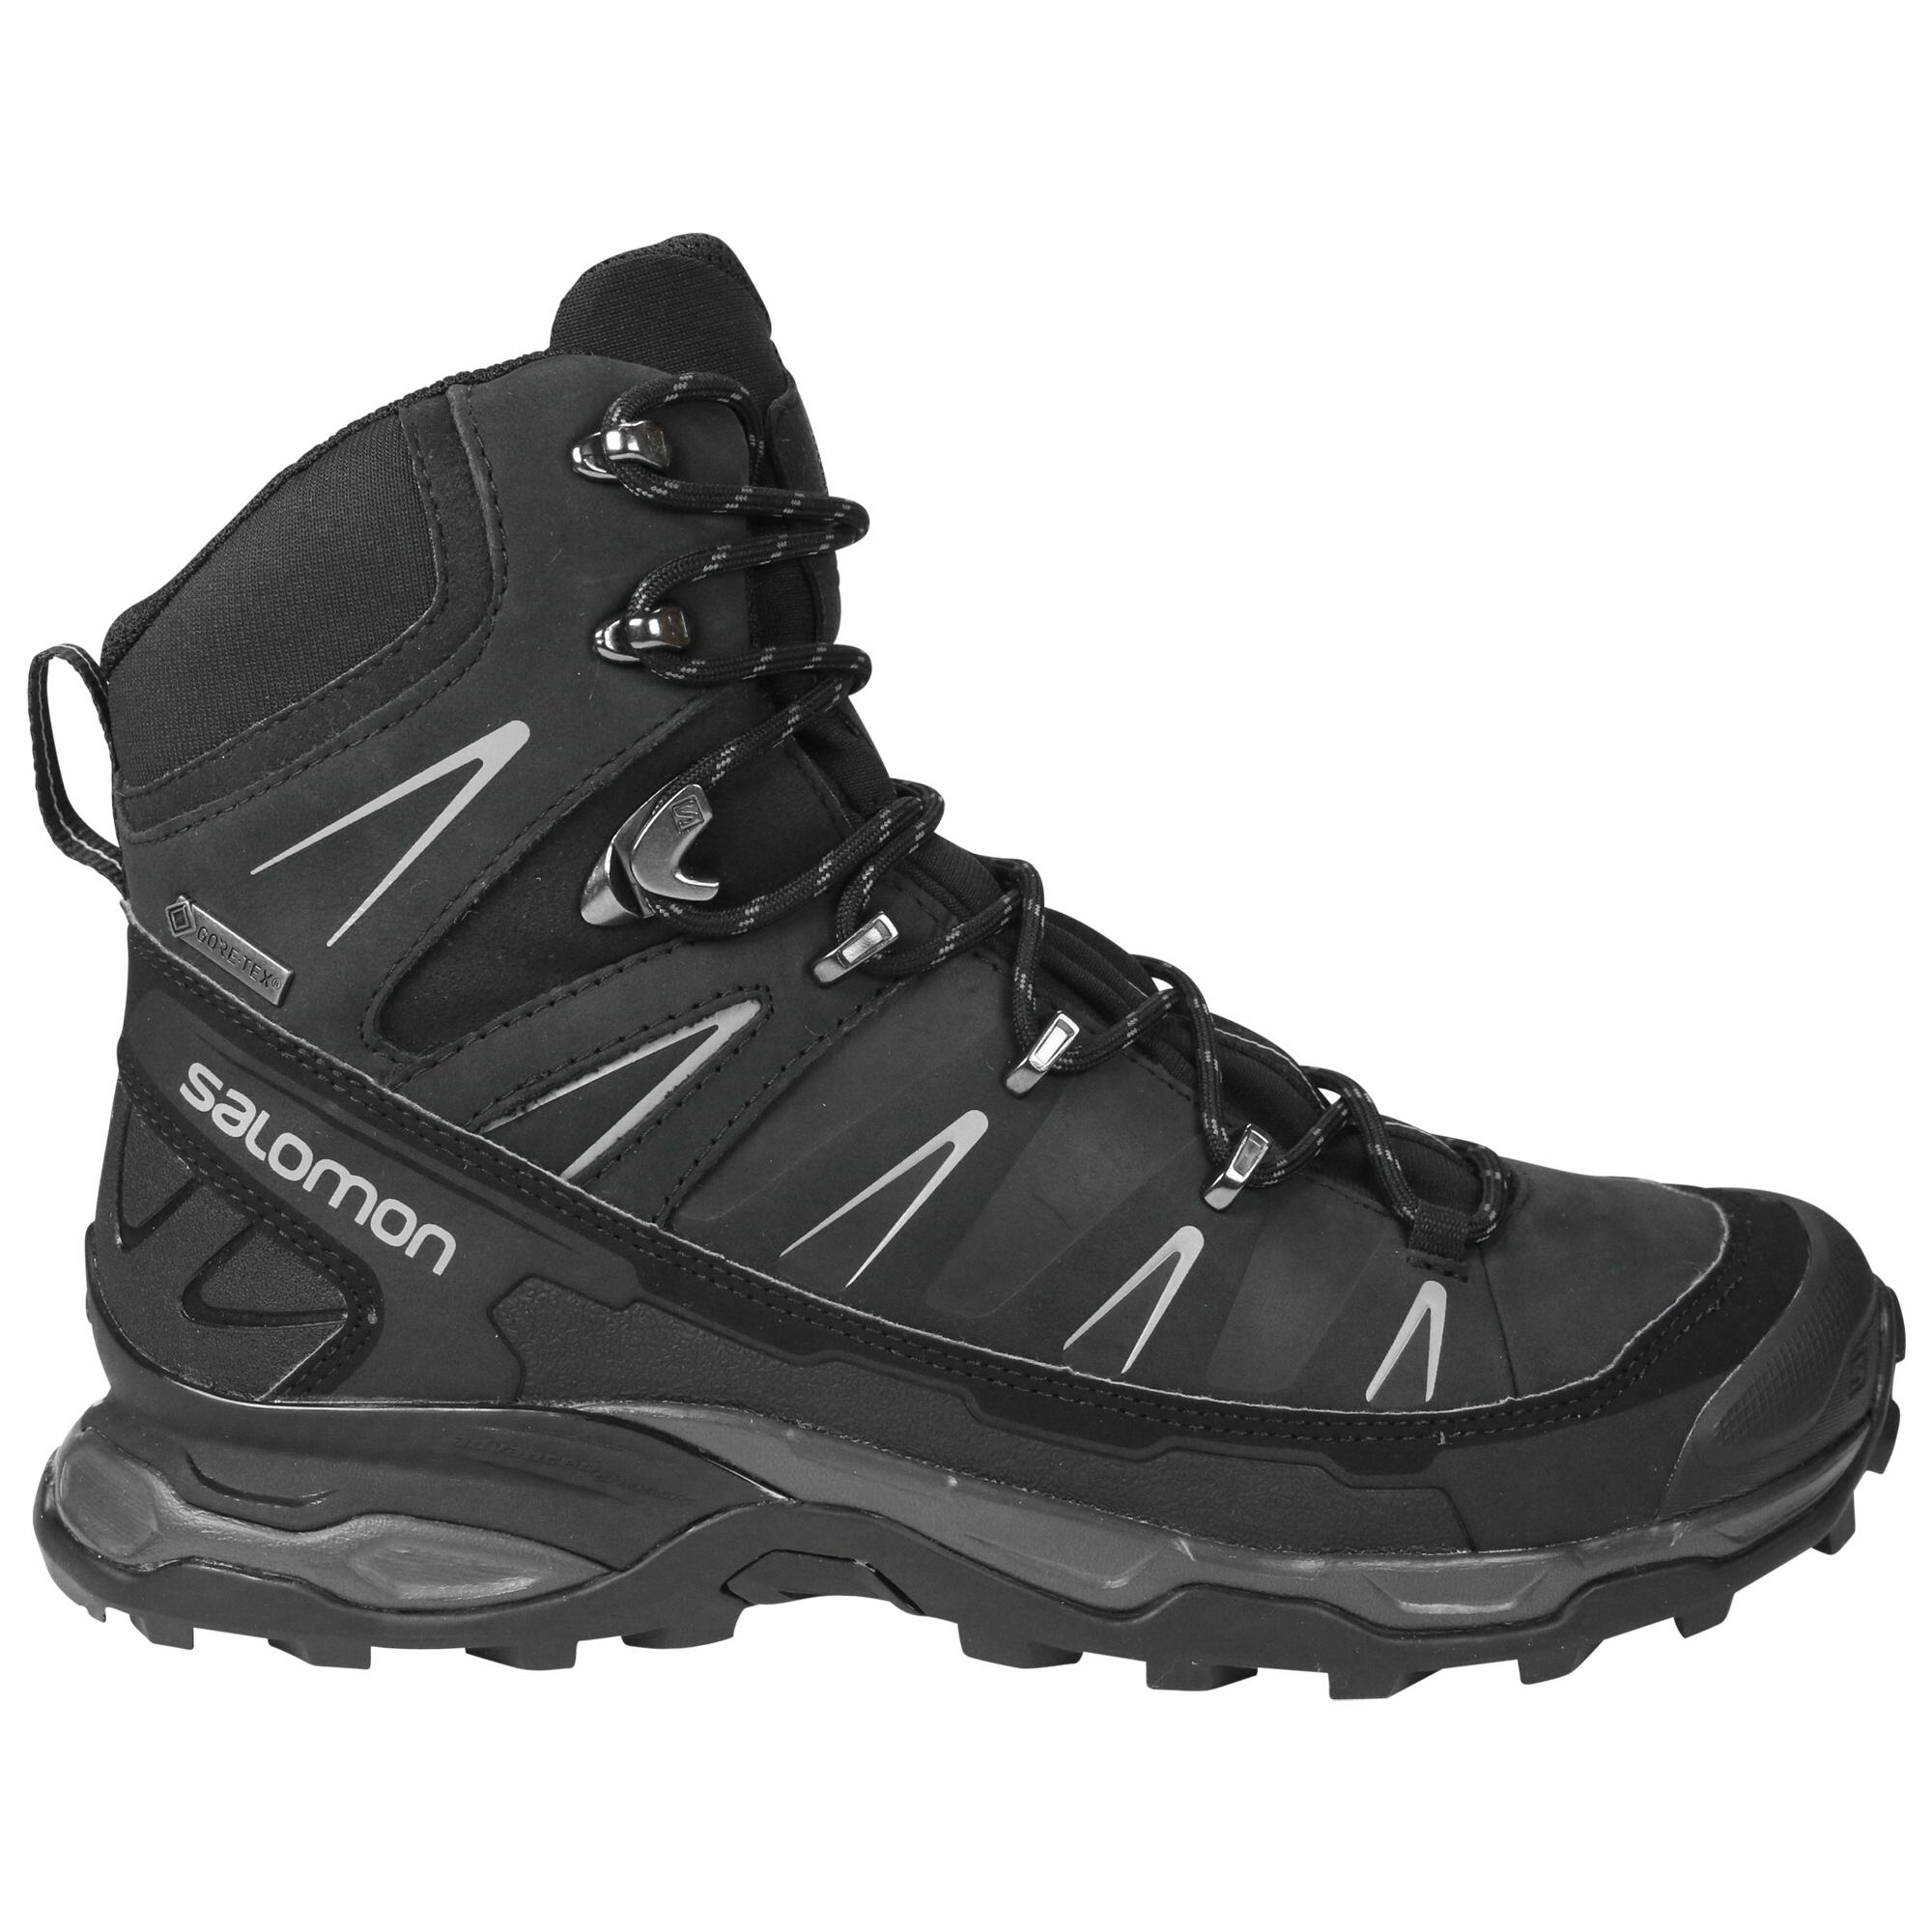 salomon x ultra trek gtx gore tex schuhe wanderschuhe boots outdoor herren ebay. Black Bedroom Furniture Sets. Home Design Ideas